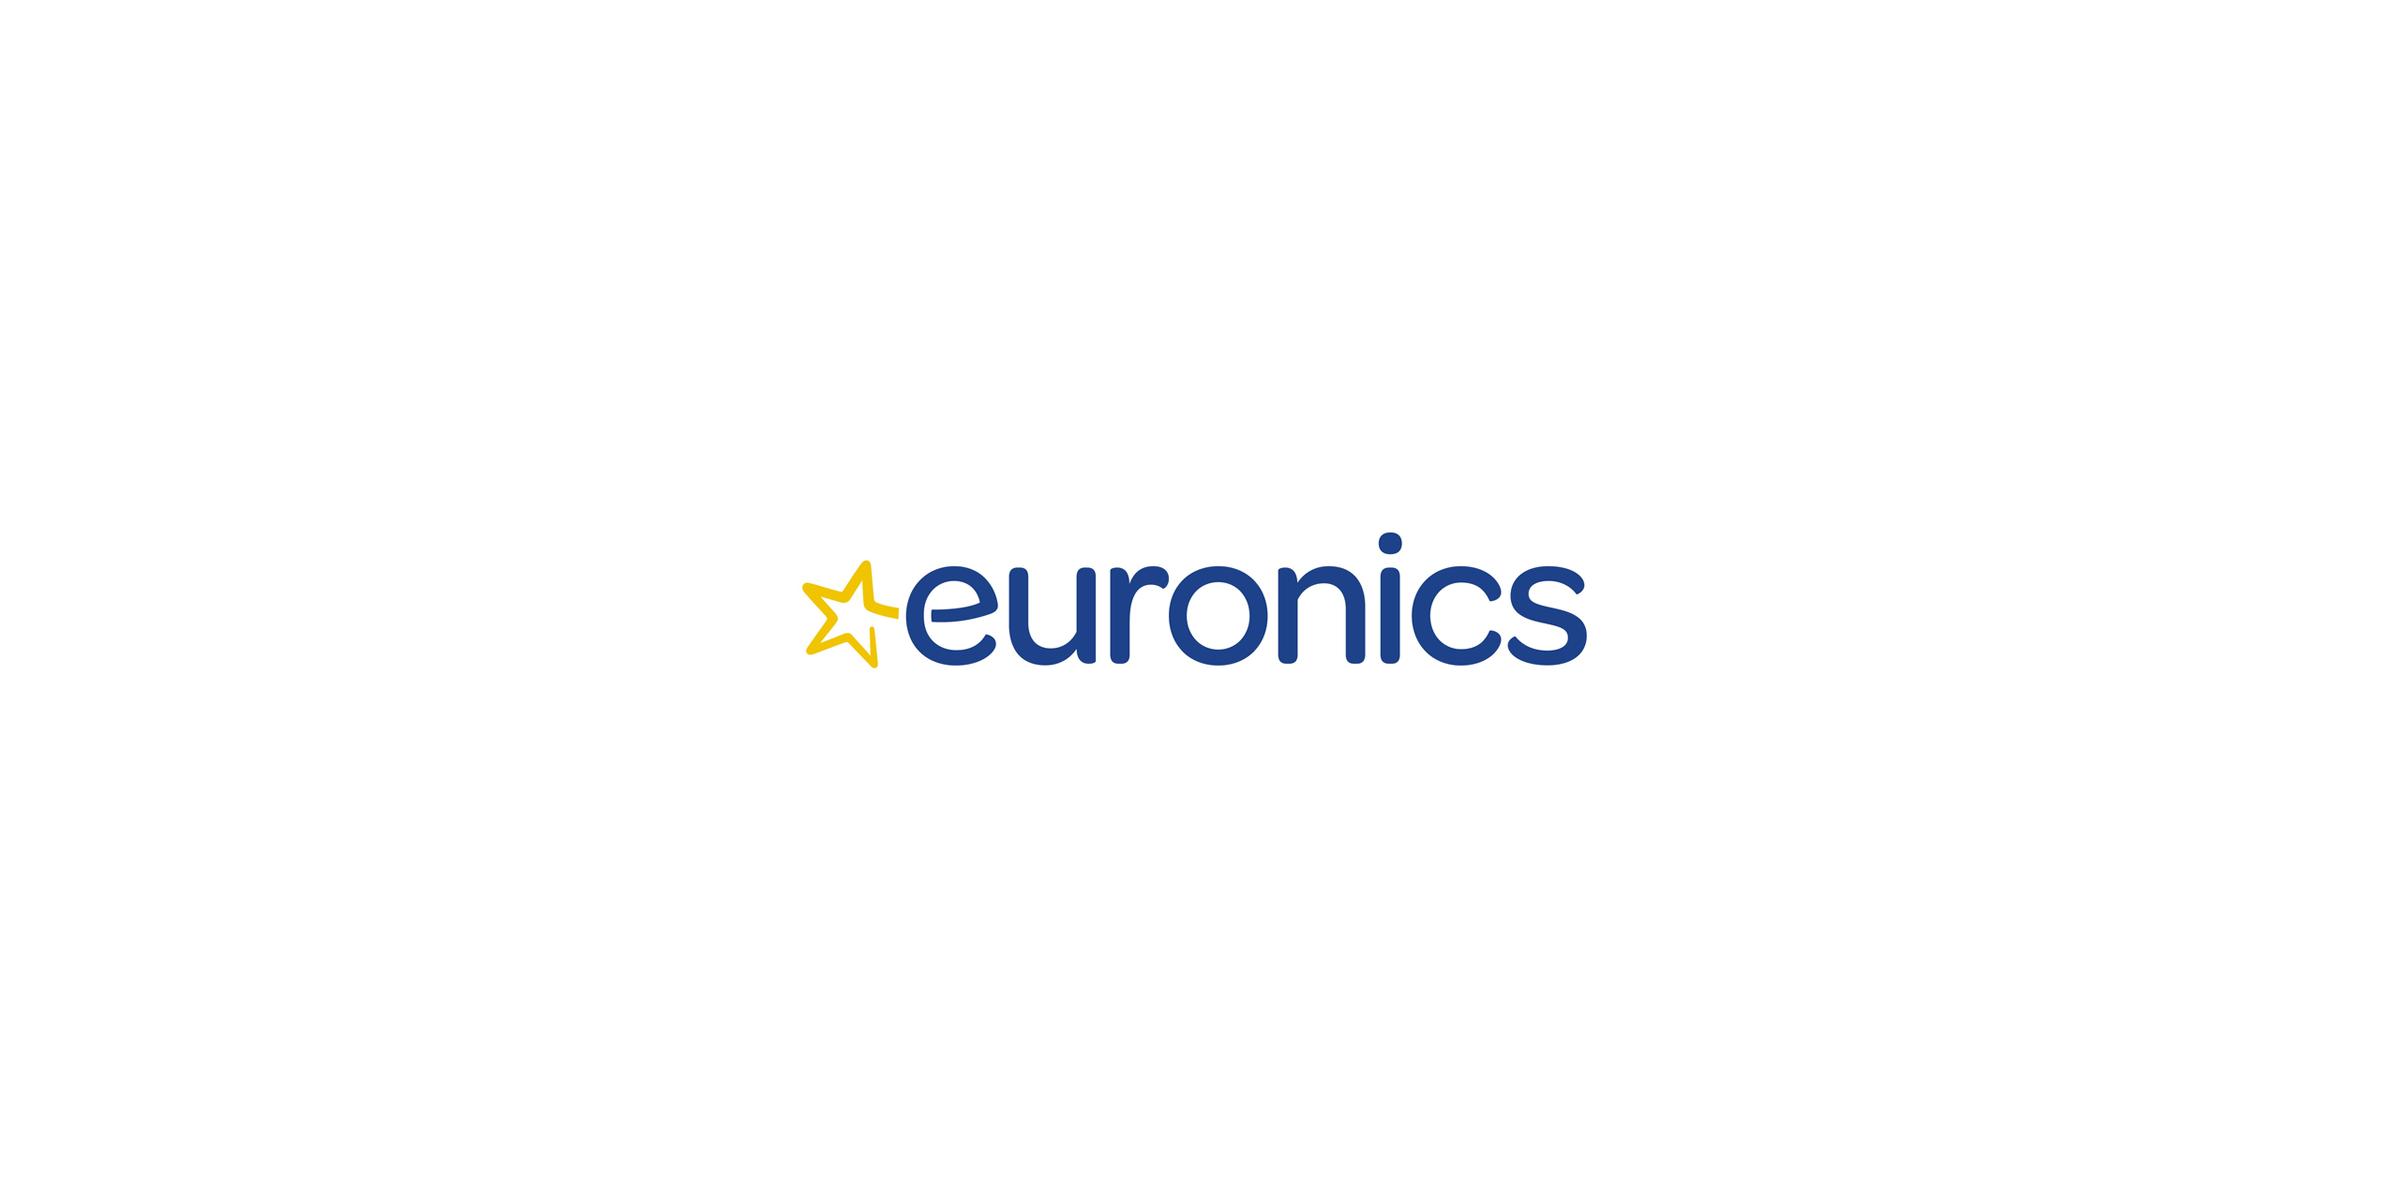 https://www.euronics.it/nova/smartphone/xiaomi/cat110059/?params=marca::xiaomi;